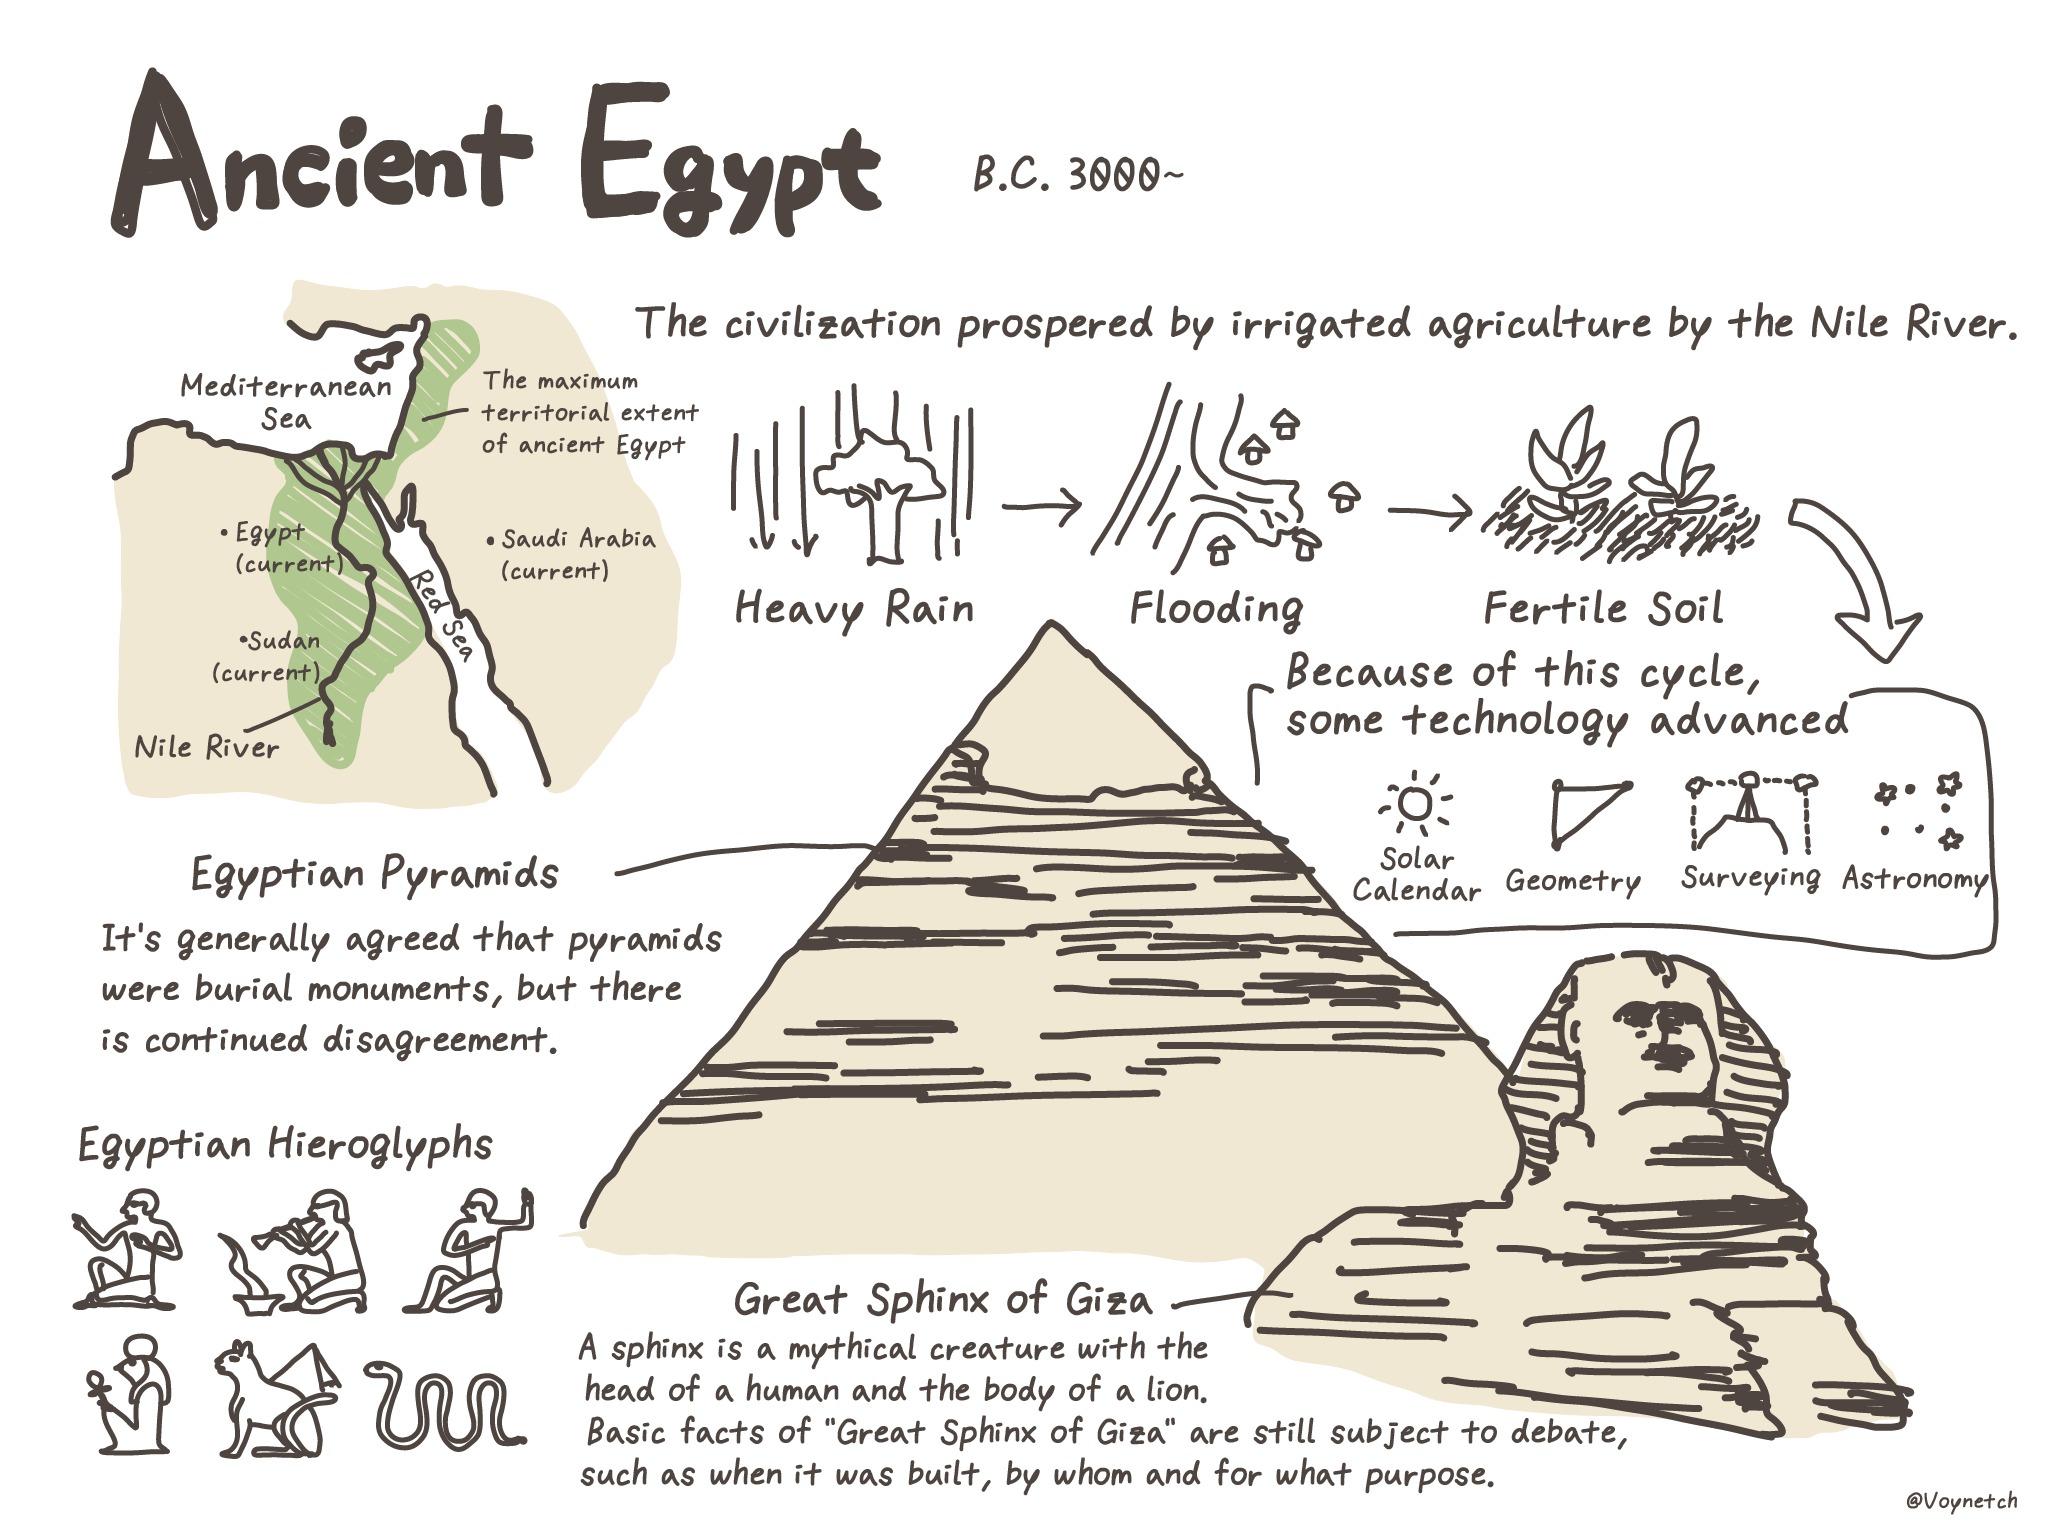 Ancient Egypt Image (1/1)